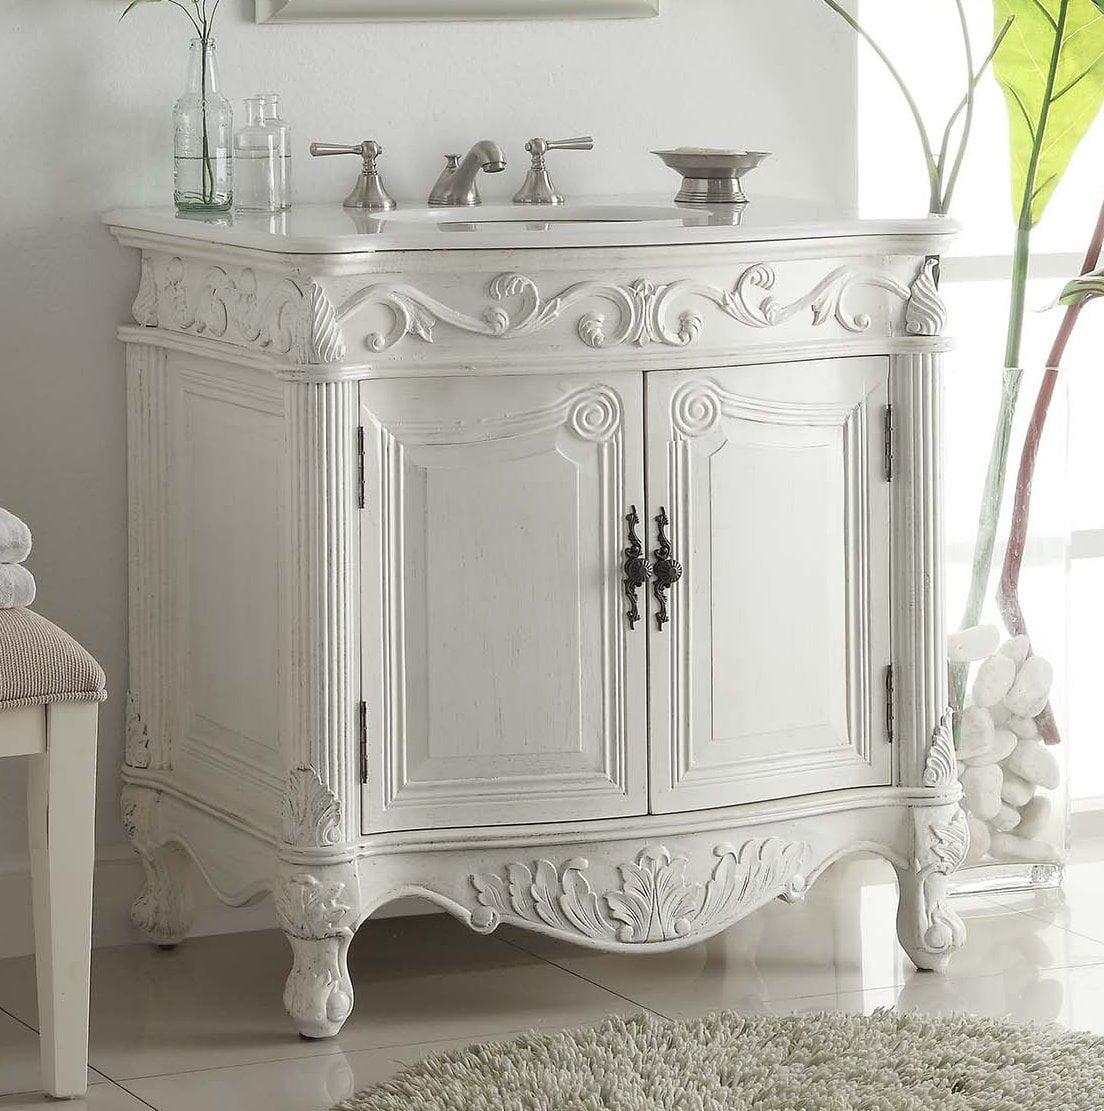 32 Benton Collection Fiesta Antique Victorian Classic Style White Bathroom Vanity Cf 2873w Aw Walmart Com Walmart Com